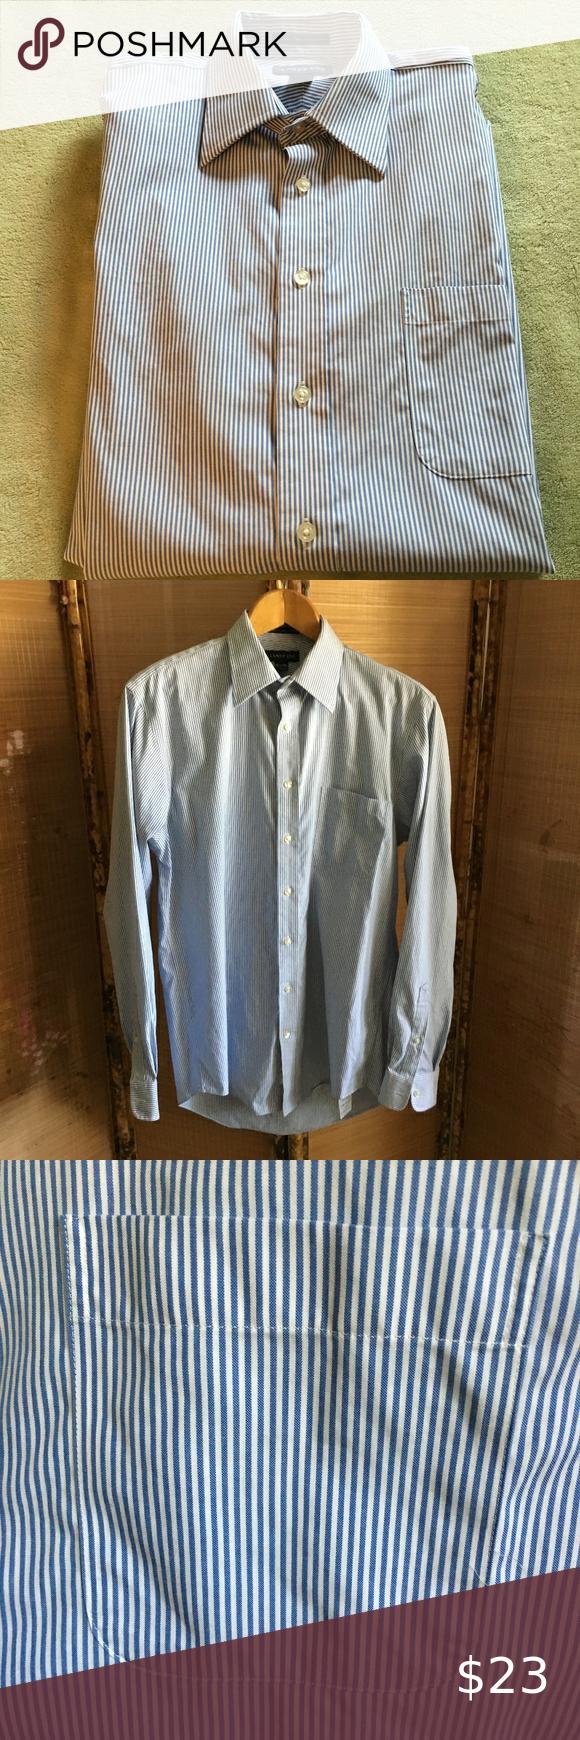 Lands End Collared Blue White Striped Dress Shirt Euc Lands End 100 Cotton Collared Blue White Striped Dress Blue Striped Dress Shirt Mens Blue Dress Shirt [ 1740 x 580 Pixel ]